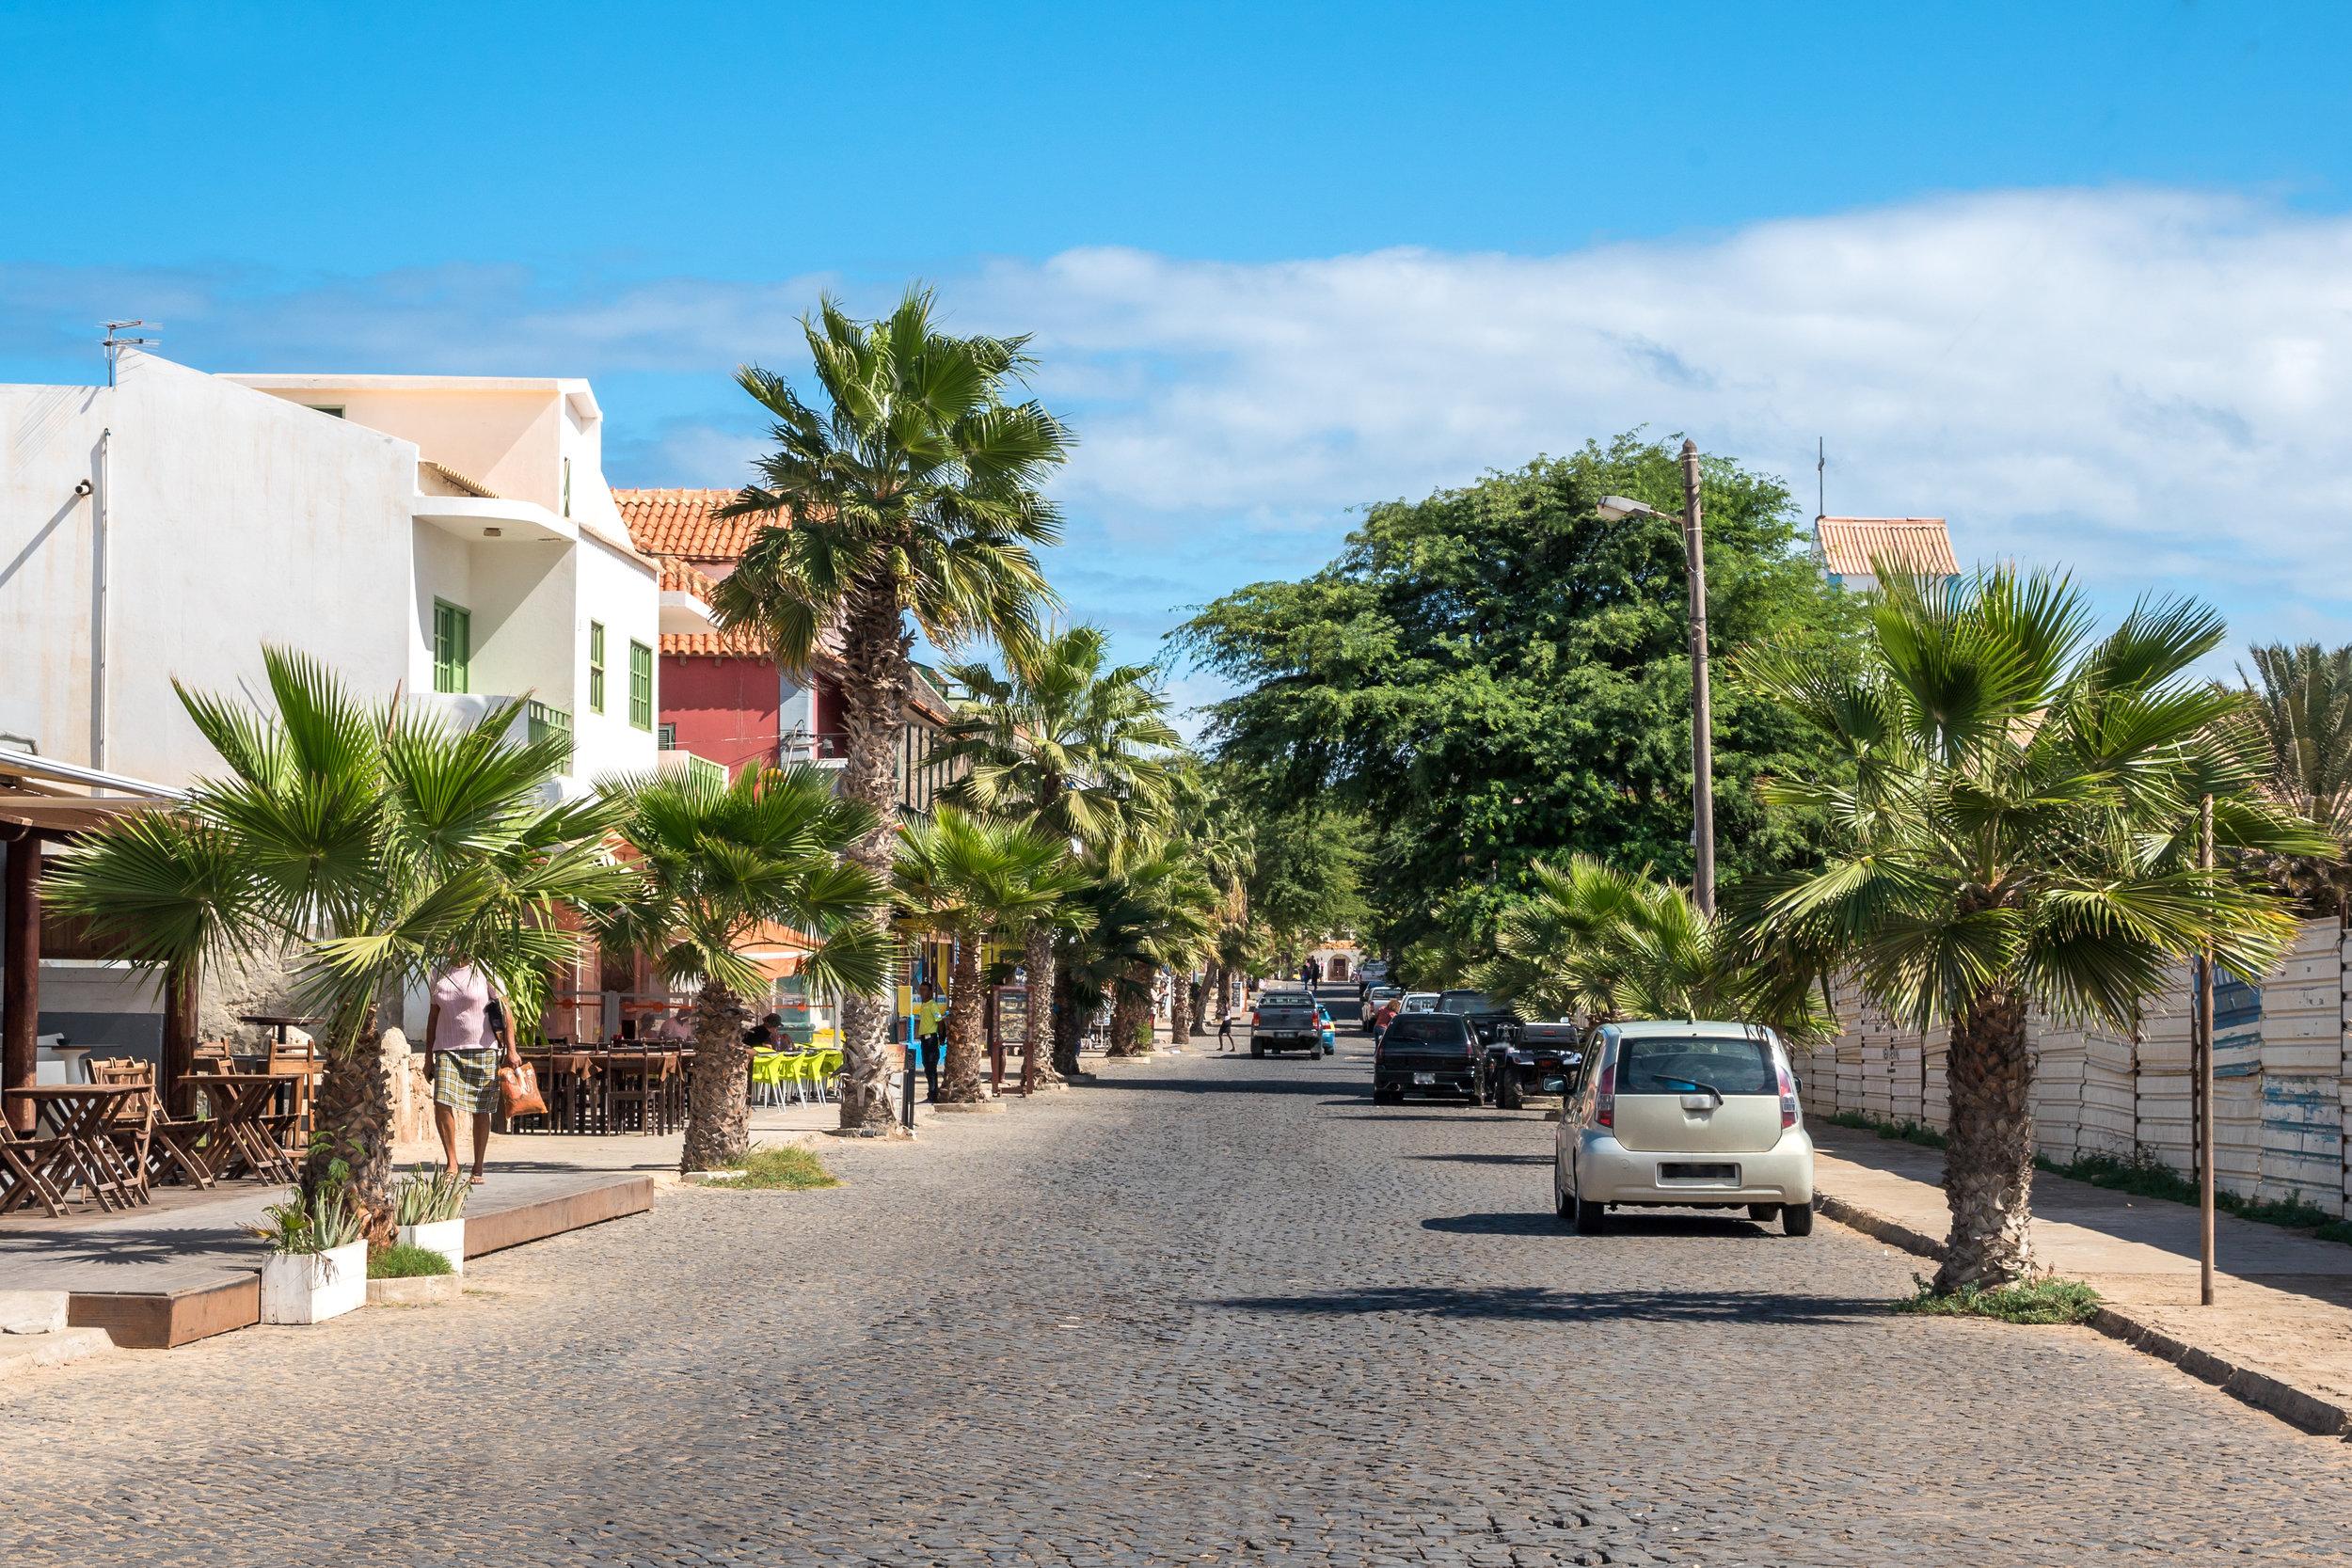 capeverde_sal_bigstock-Street-Of-Santa-Maria-In-Sal-C-79429435.jpg